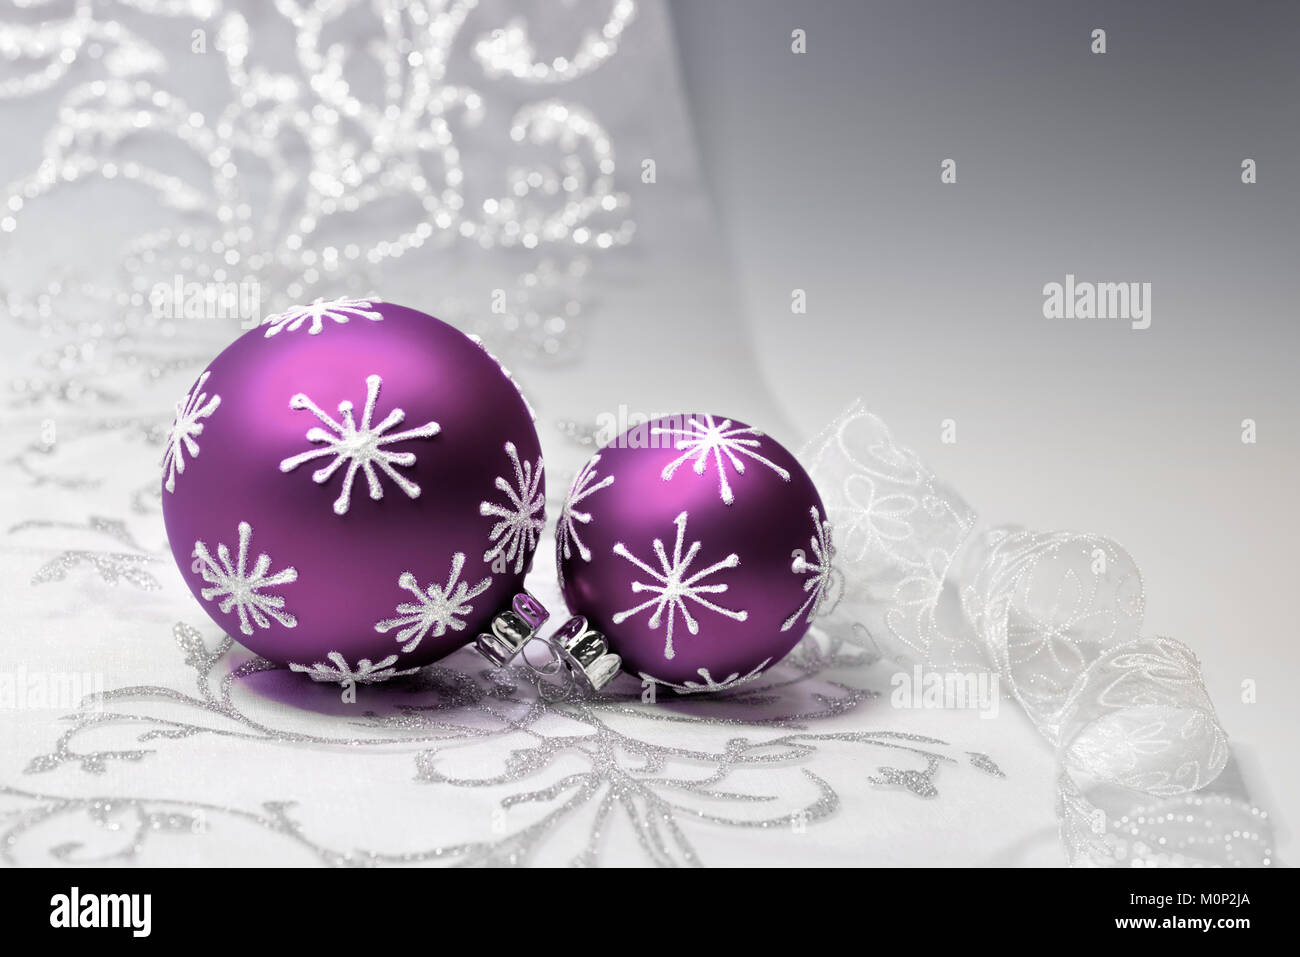 Christbaumkugeln Violett.Lila Christbaumkugeln Mit Silber Verzierung Auf Silbernem